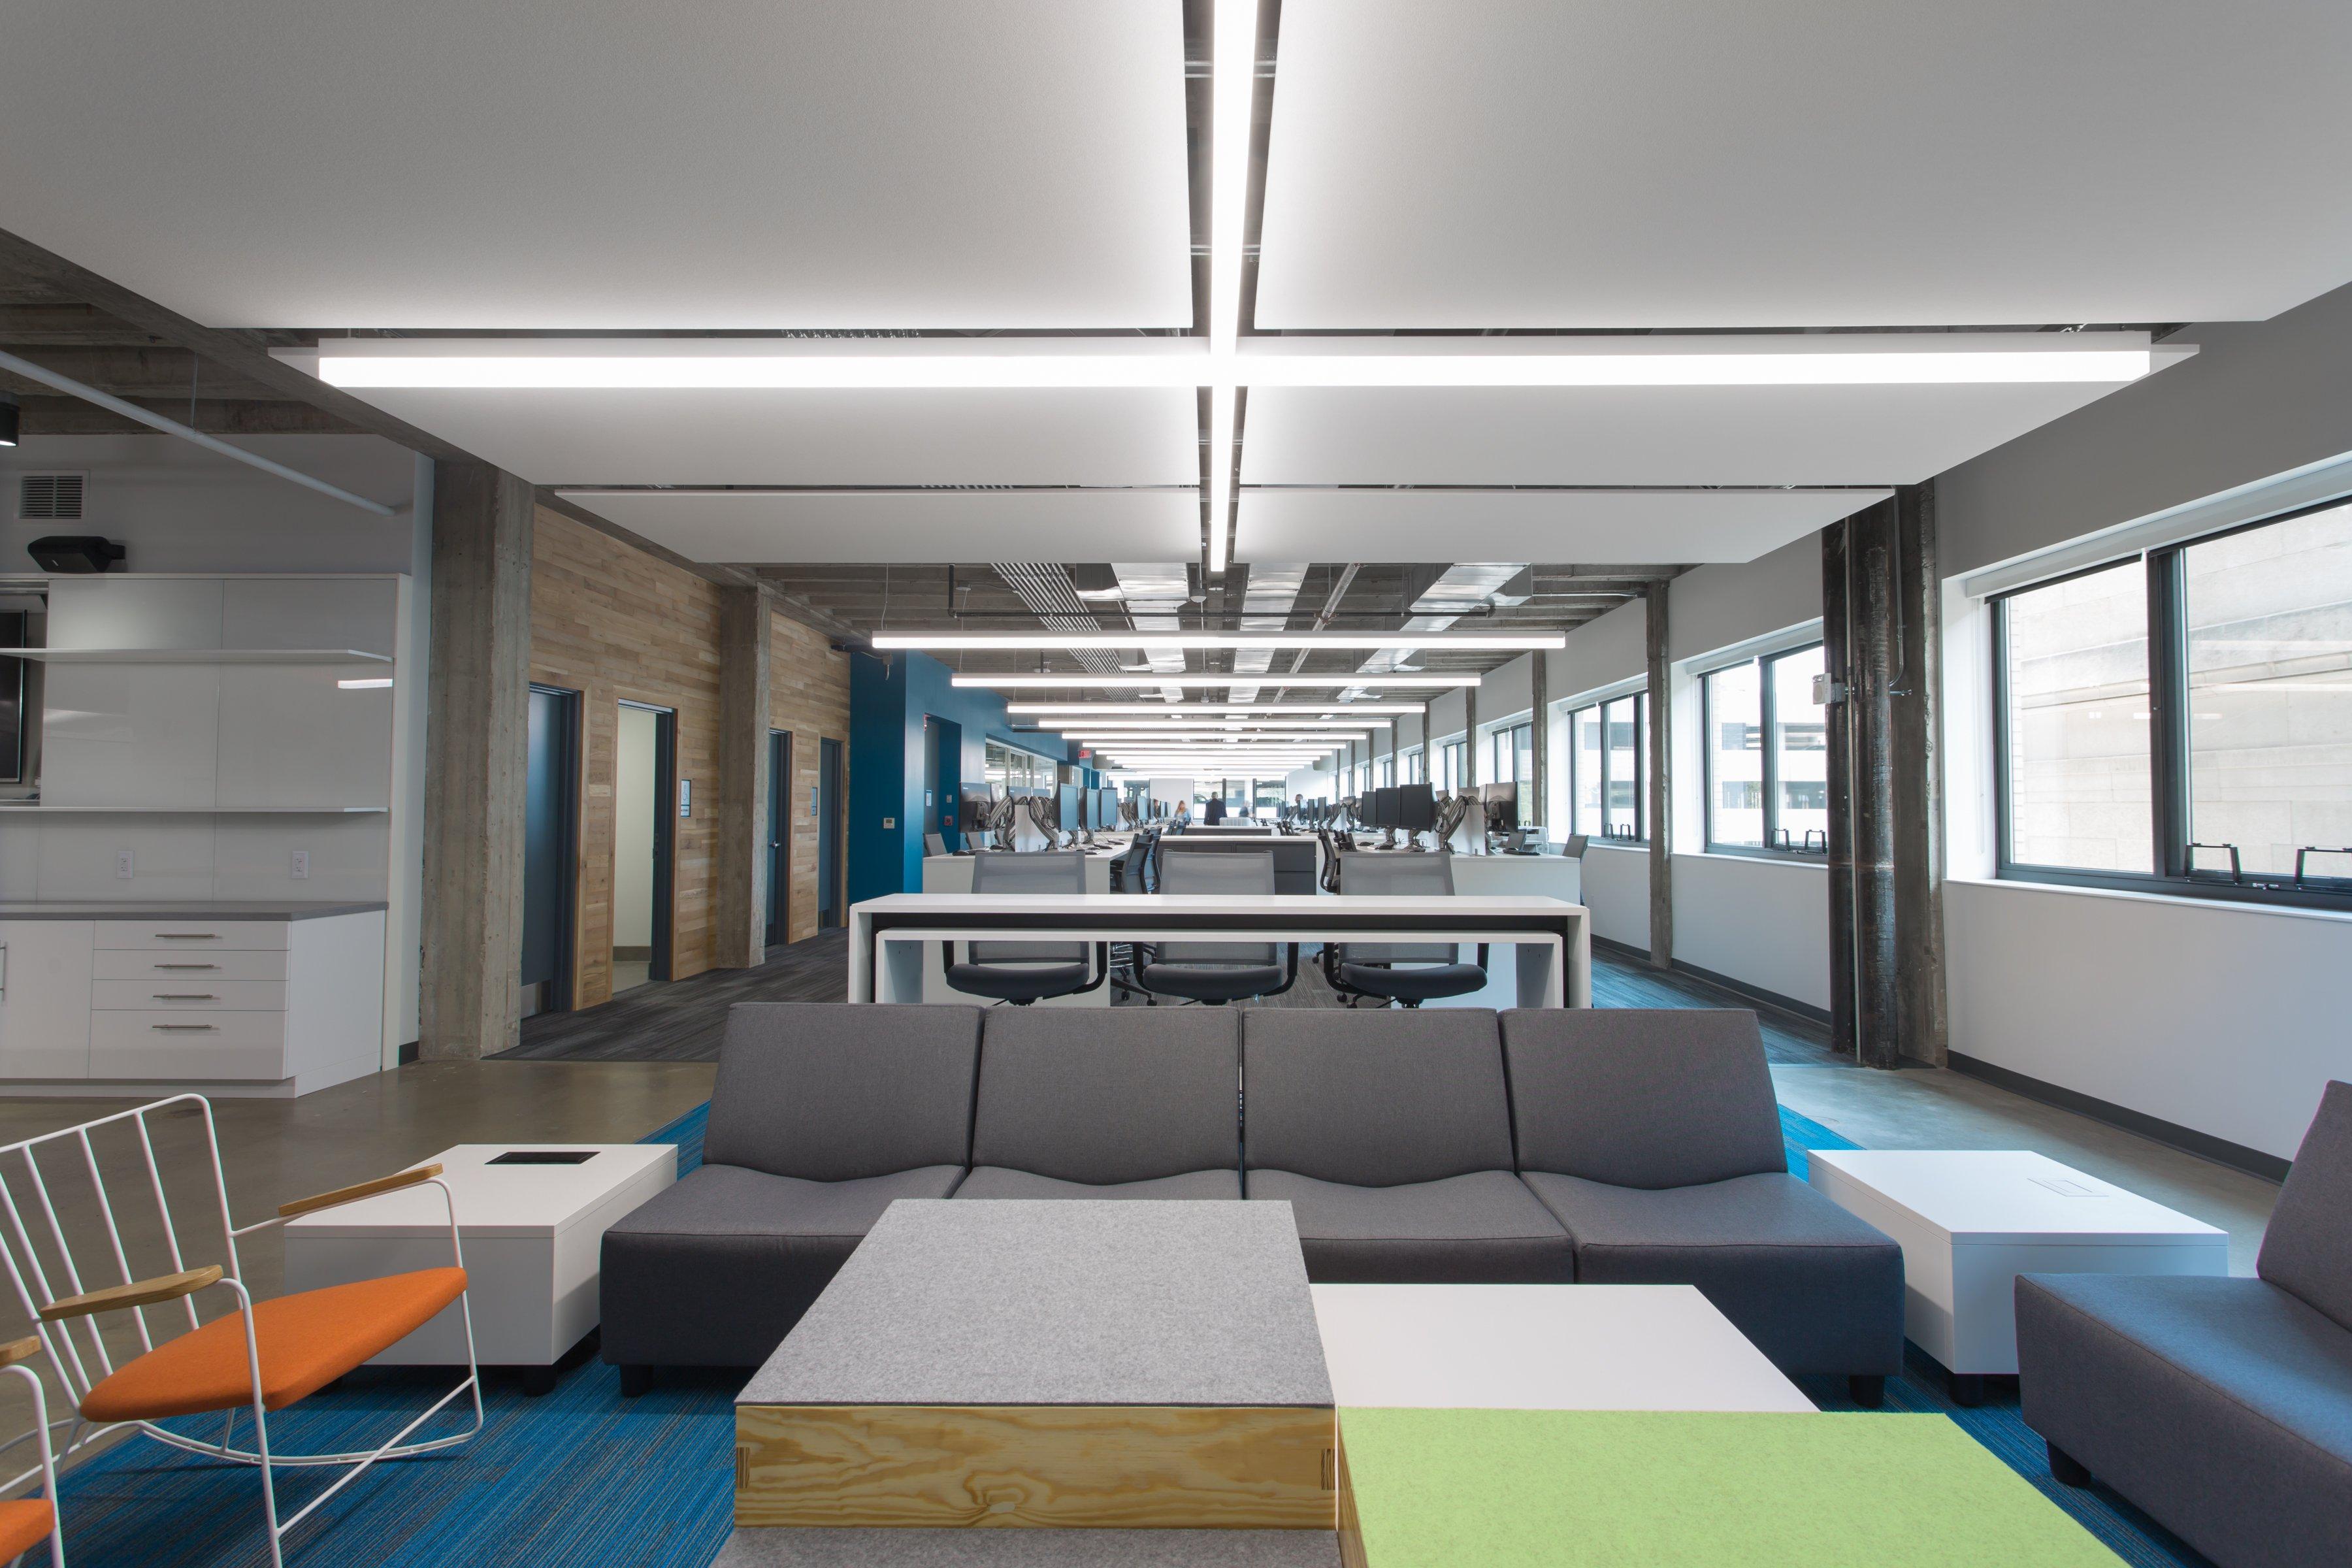 Encova Mutual Insurance Columbus OH office furniture interior open-concept